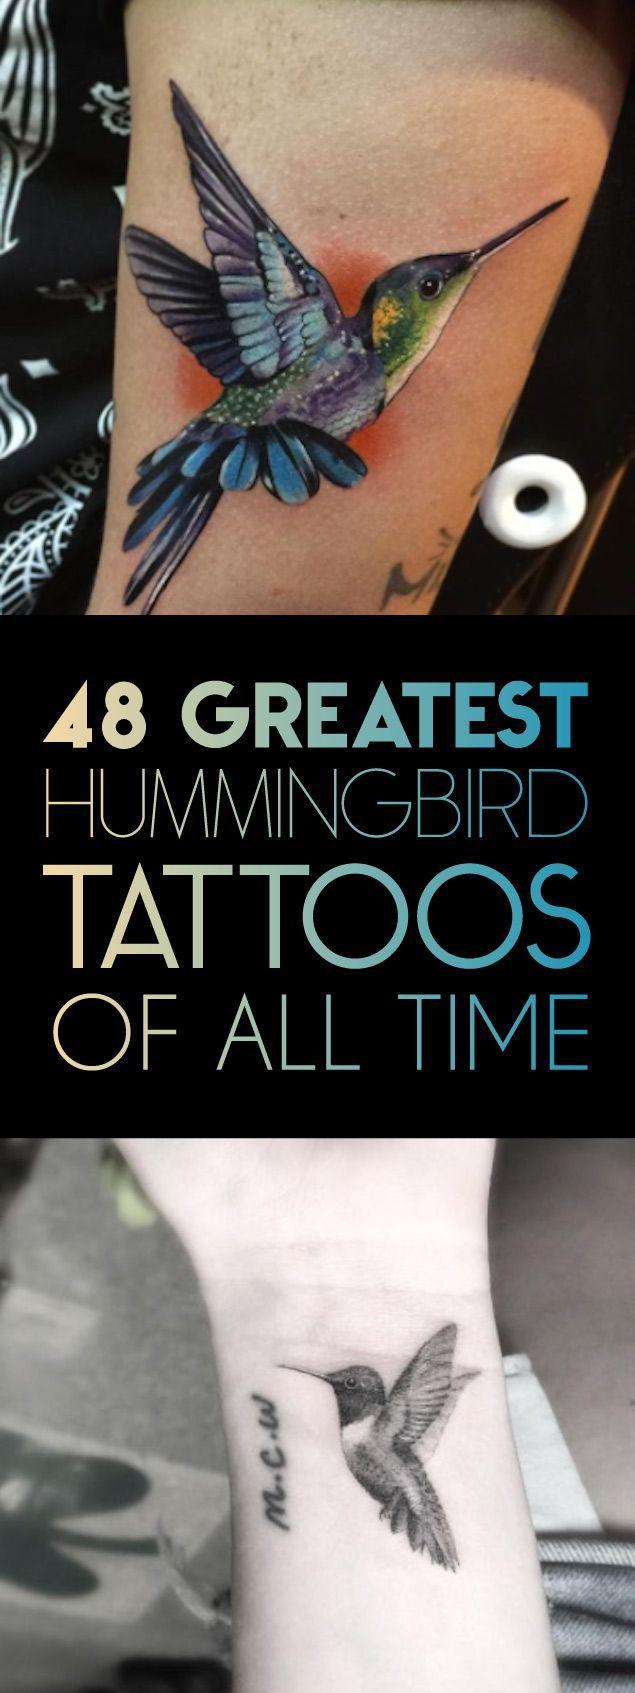 best tattoo ideas images on pinterest hummingbird tattoo